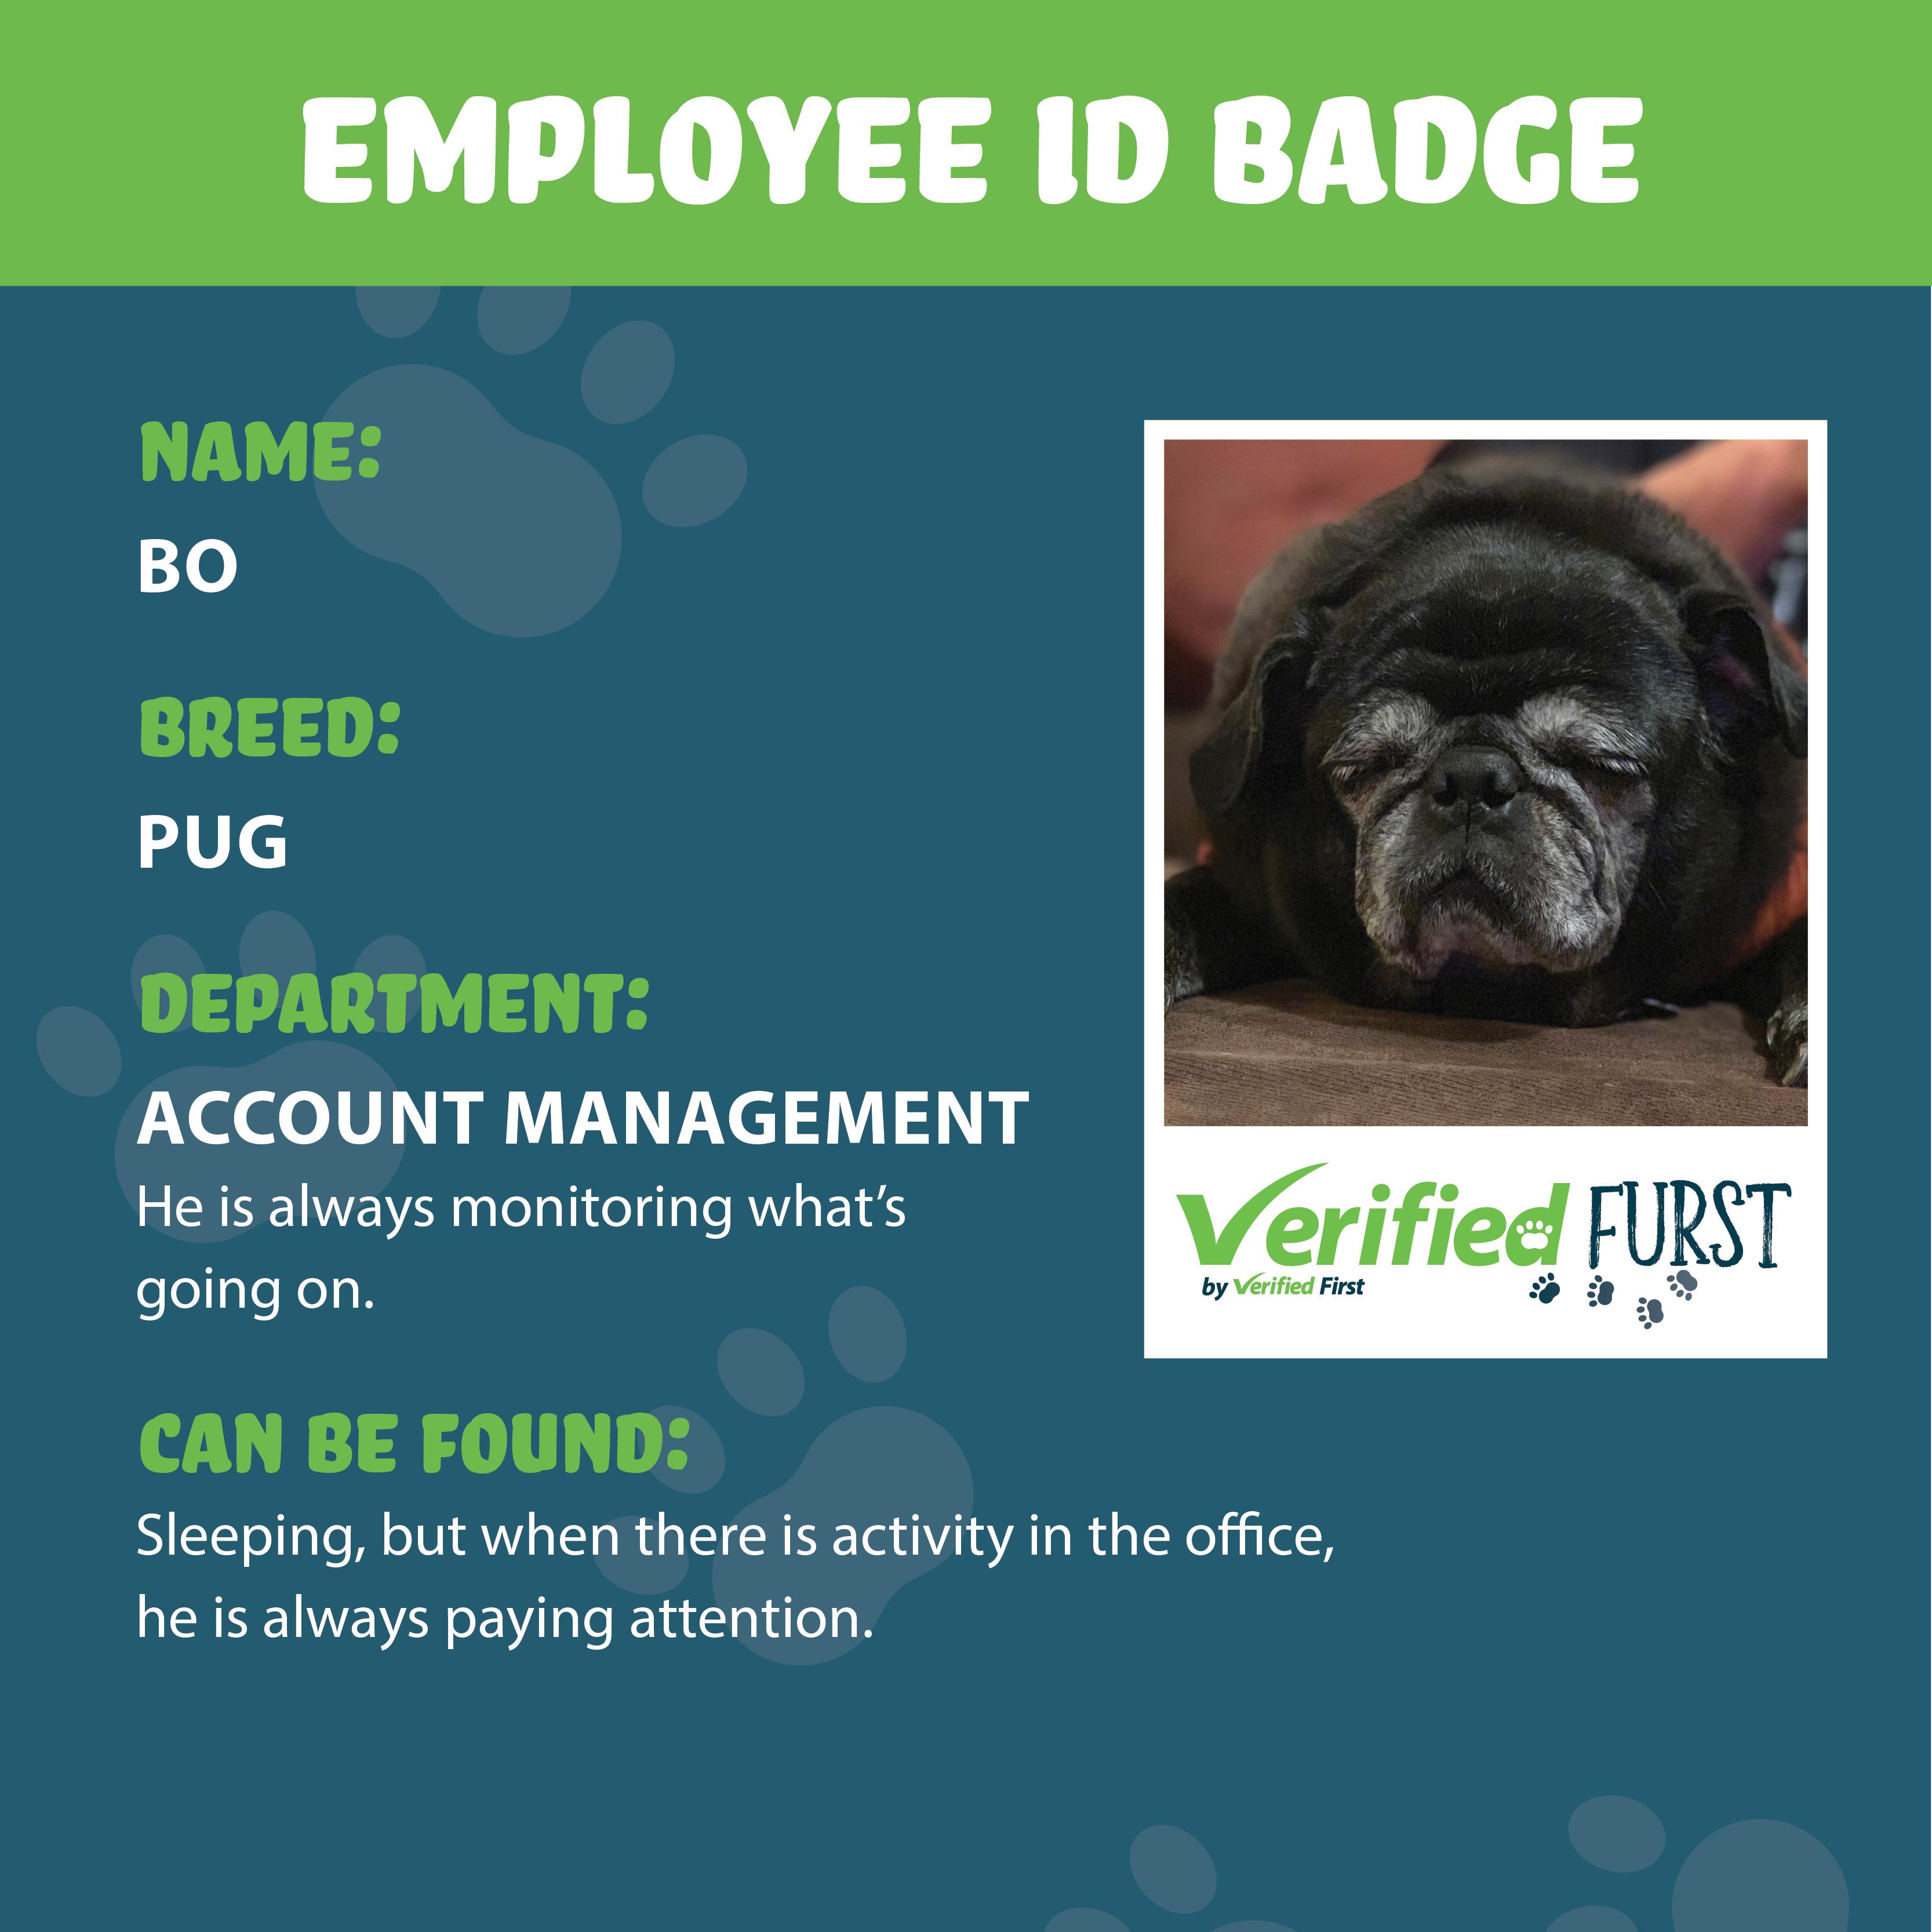 VerifiedFurst_Bo-Pug